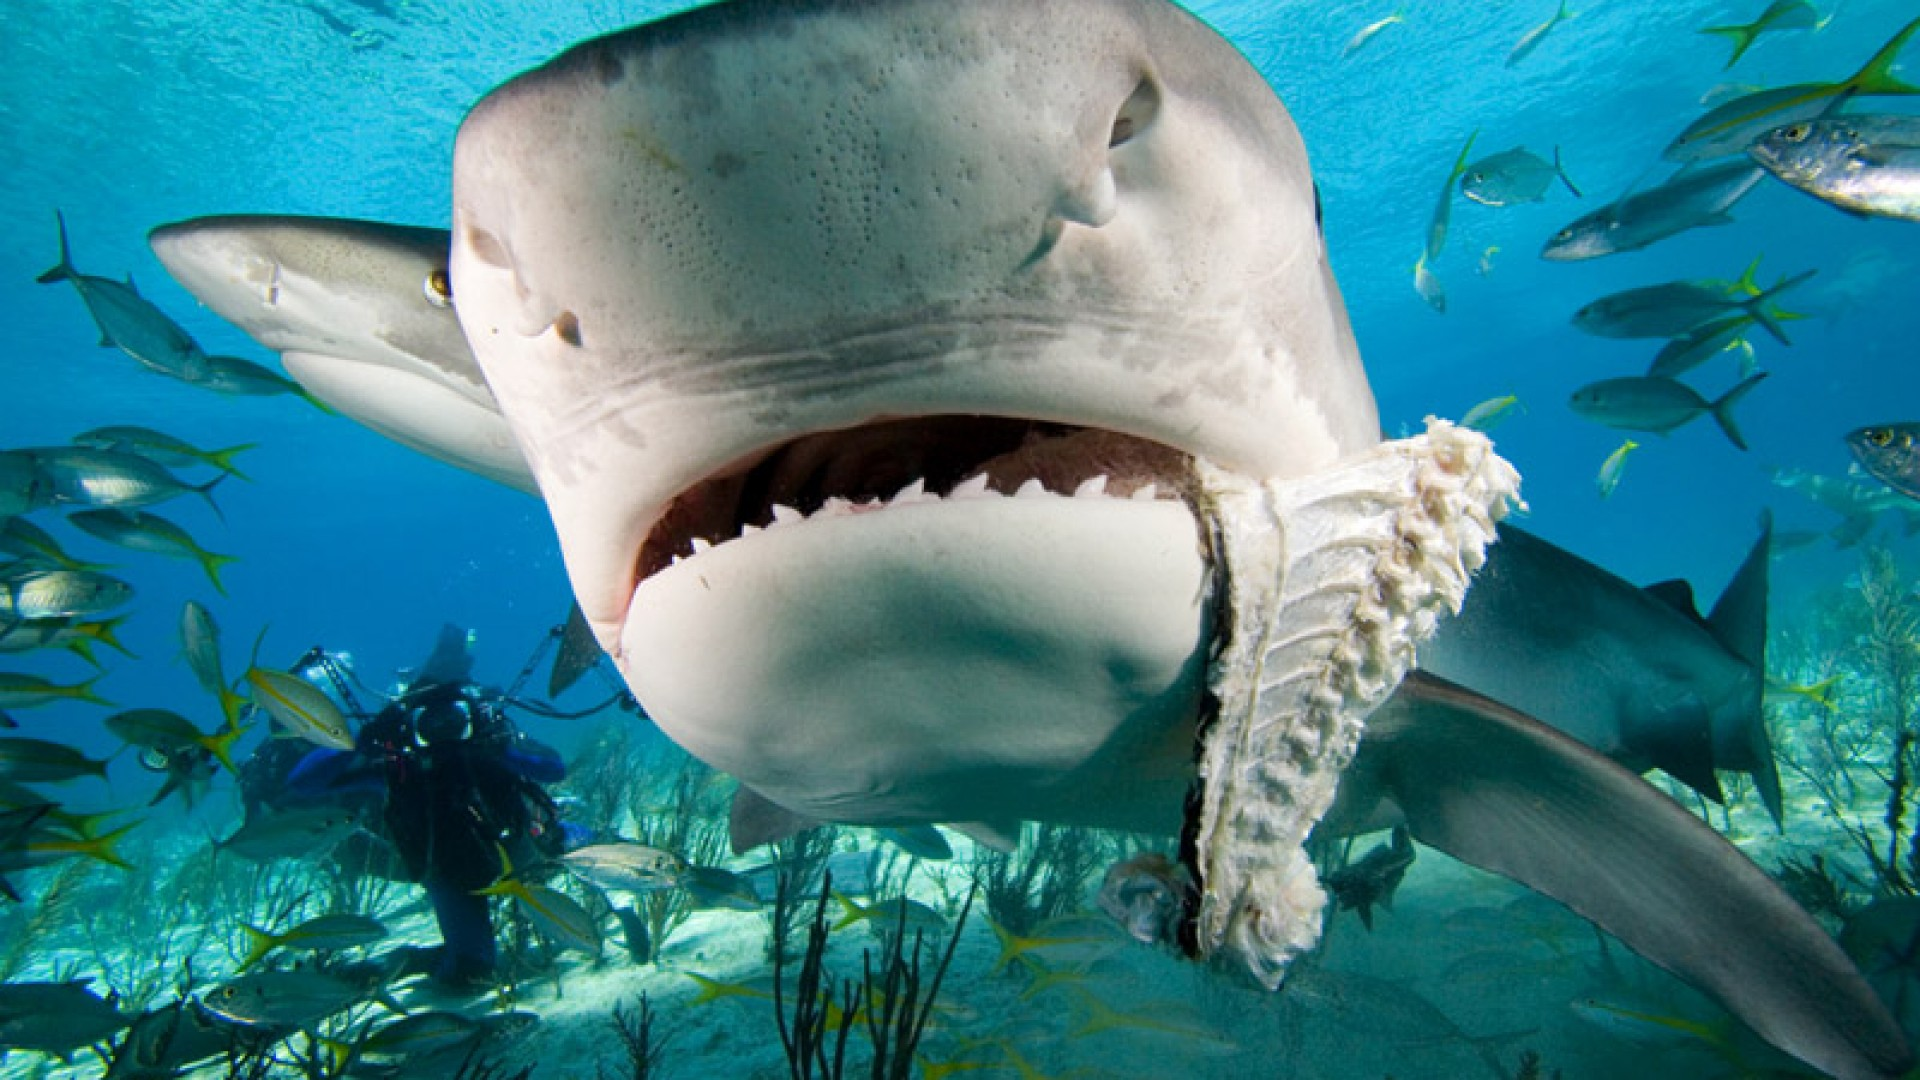 Fish Tank Wallpaper Hd Shark Wallpaper Hd Pixelstalk Net